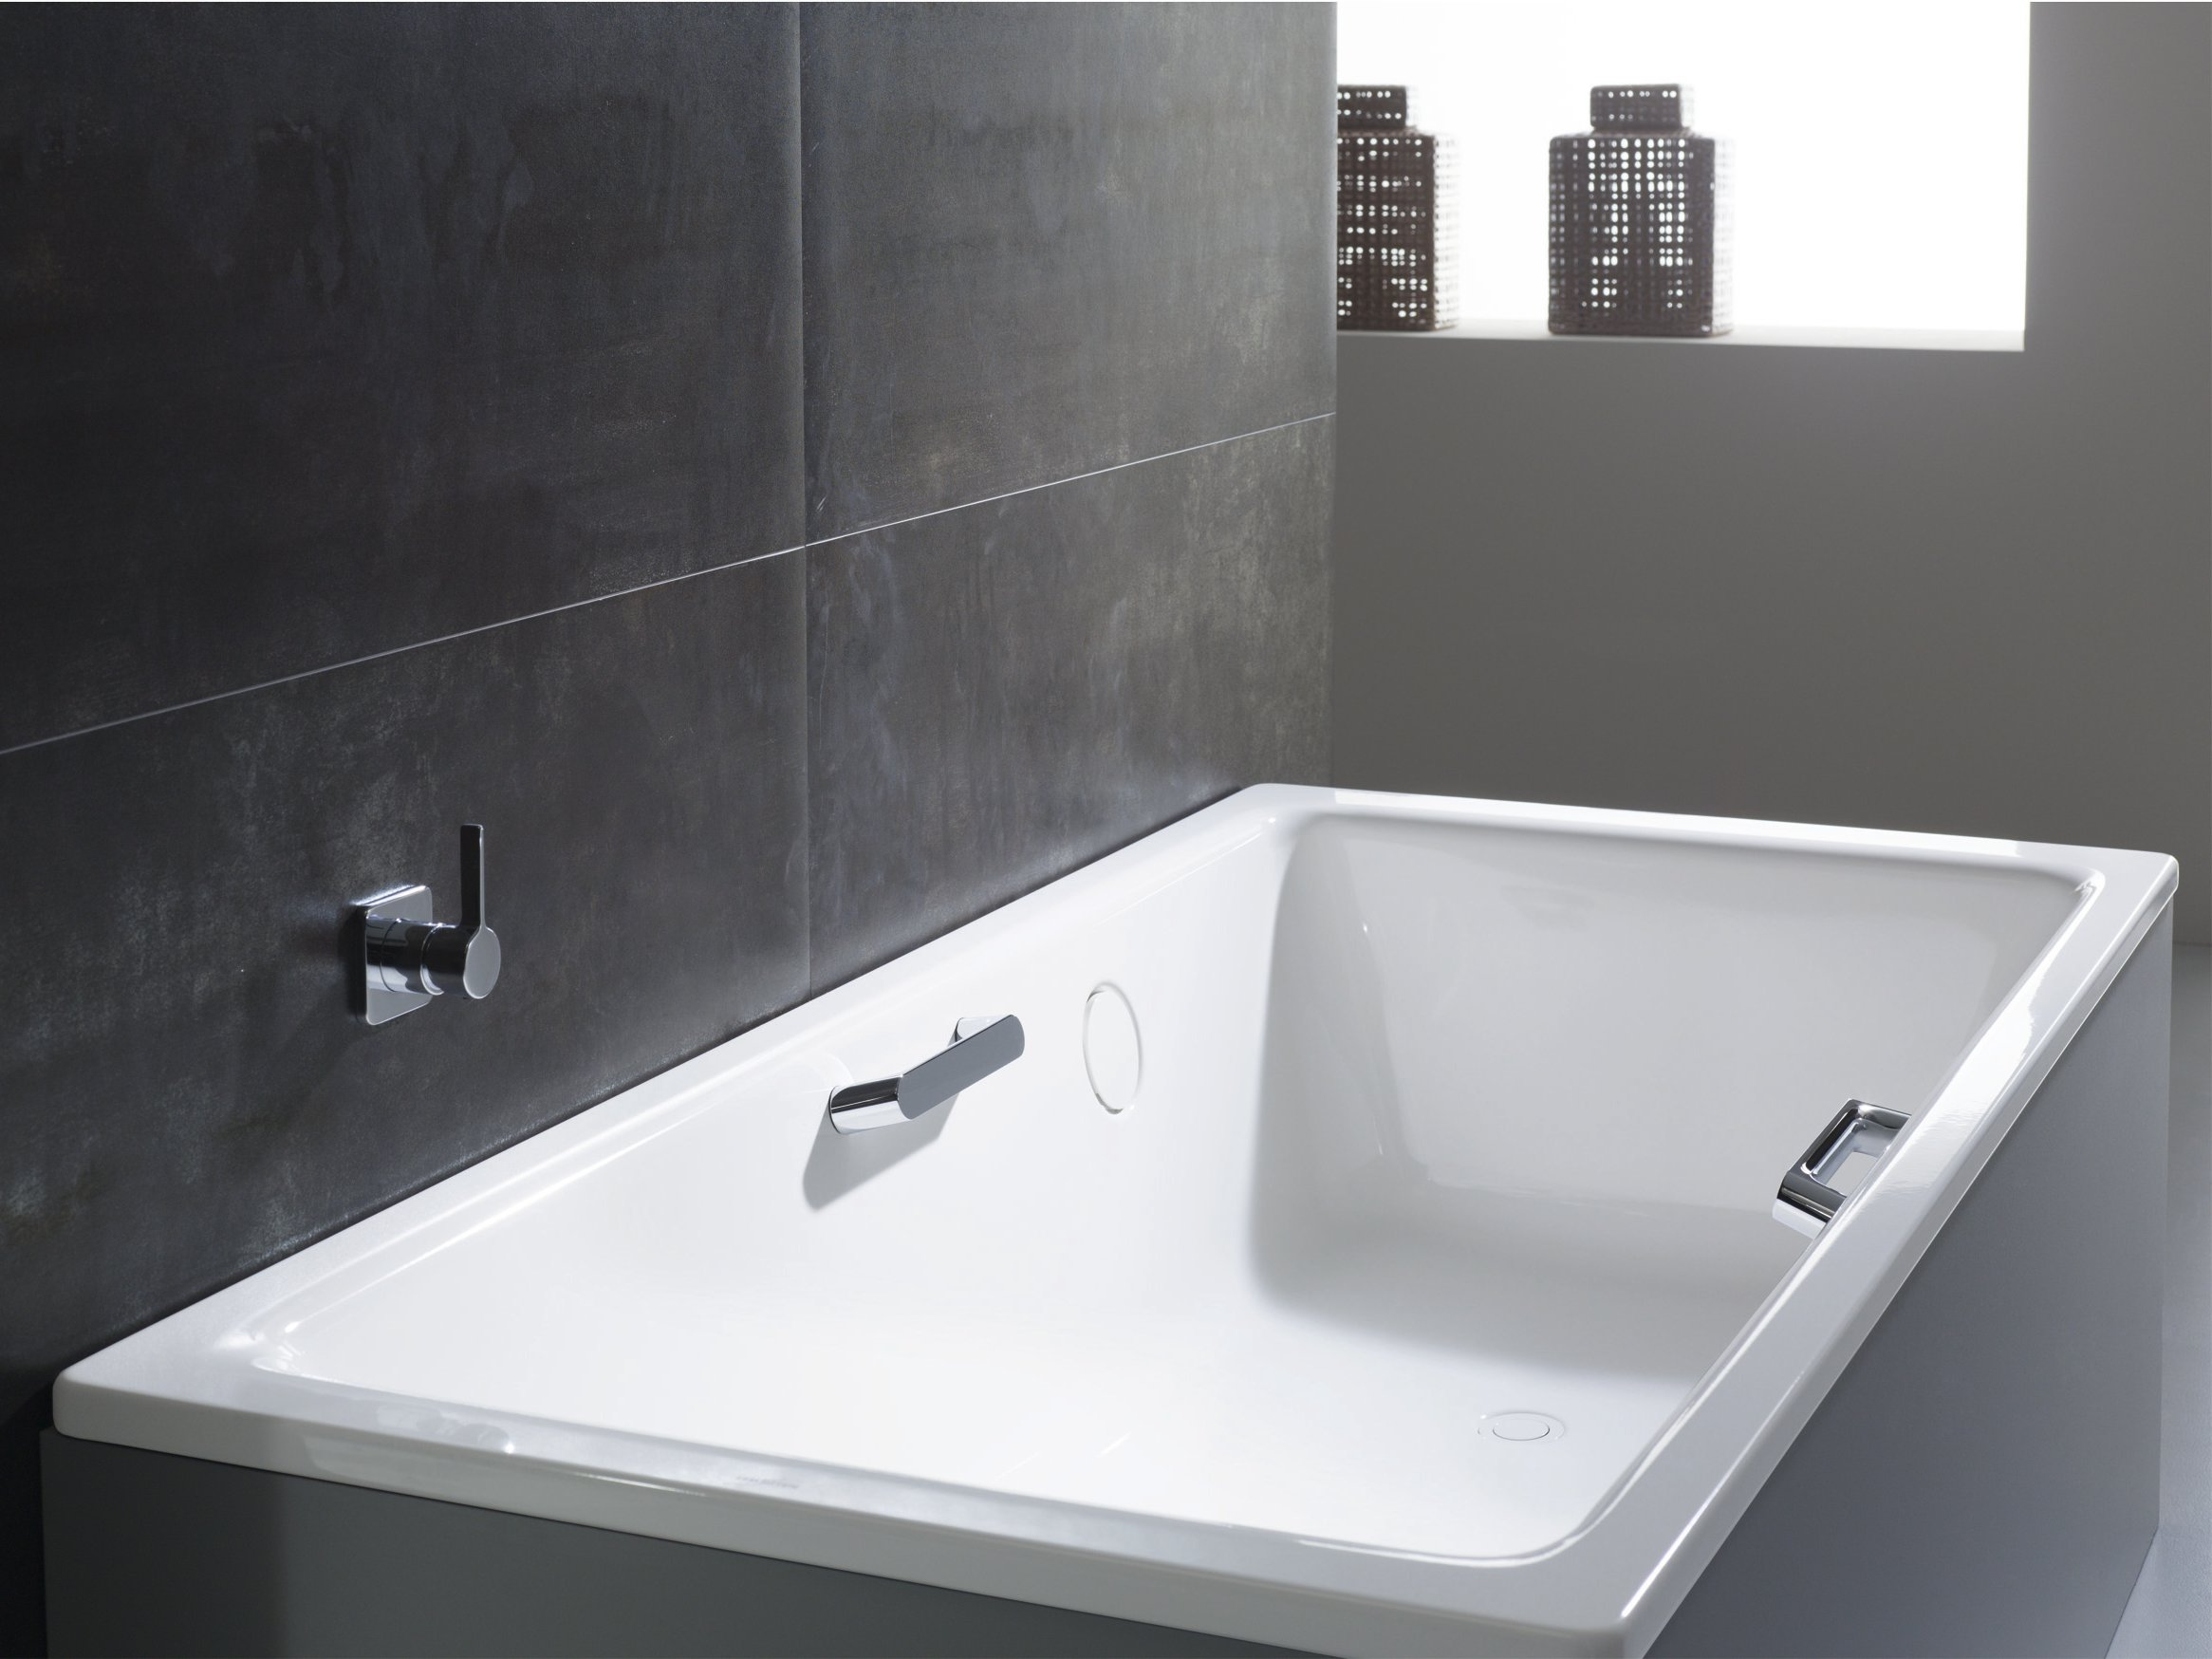 Haltegriff nobler purismus by kaldewei italia design - Vernici per vasche da bagno ...